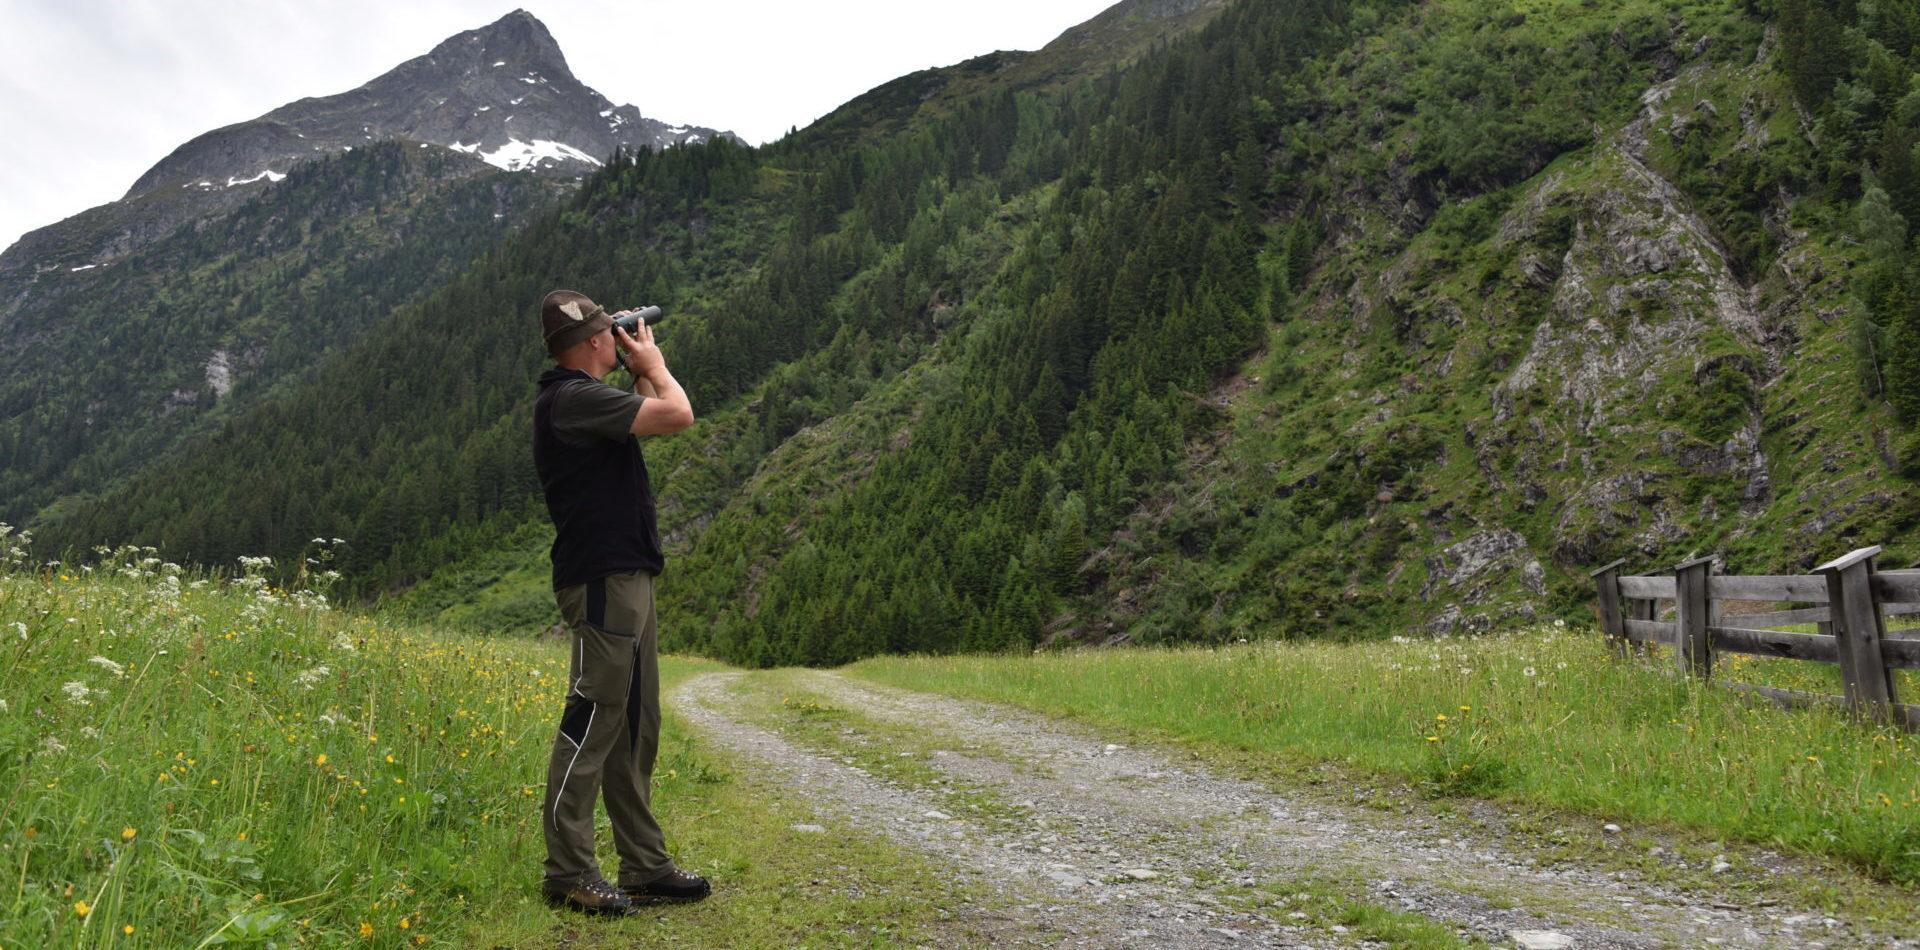 COVID-19: Aufgaben der Jägerschaft   Tiroler Jägerverband